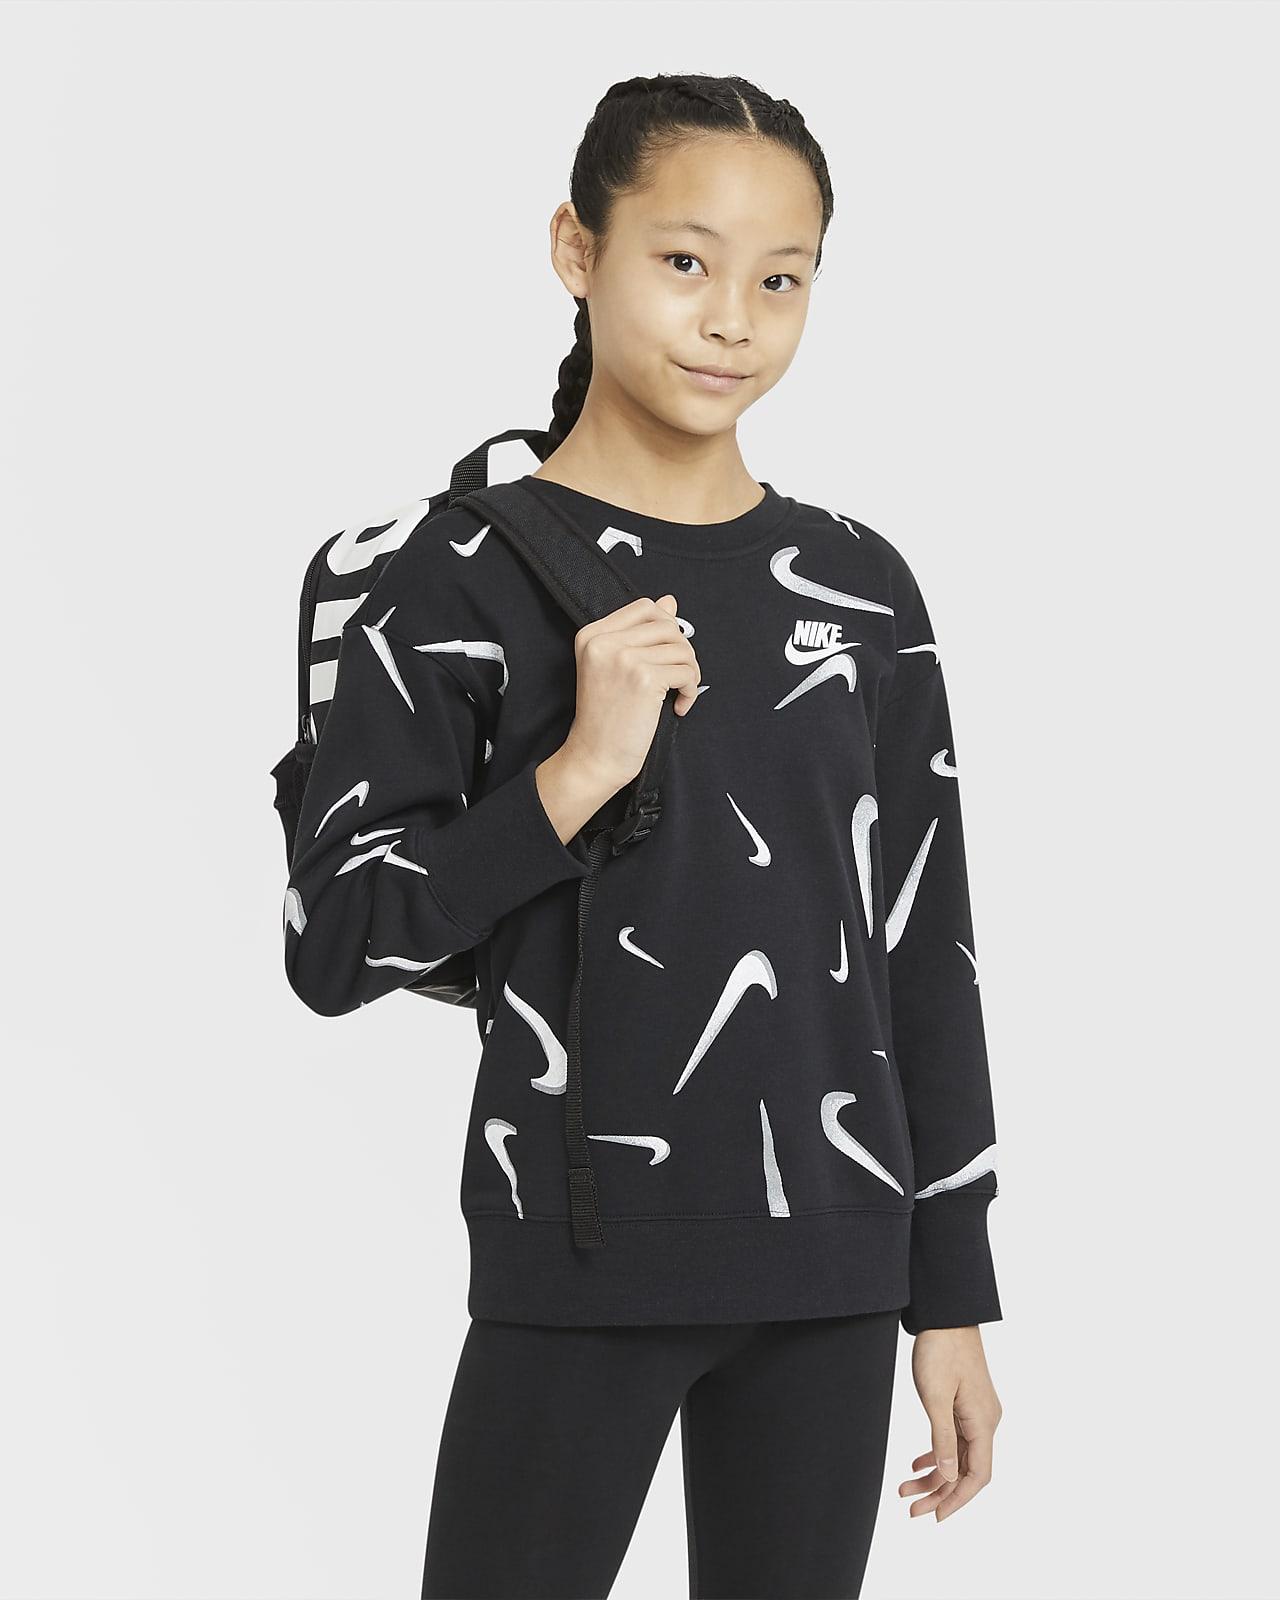 Nike Sportswear Meisjesshirt van sweatstof met print en ronde hals